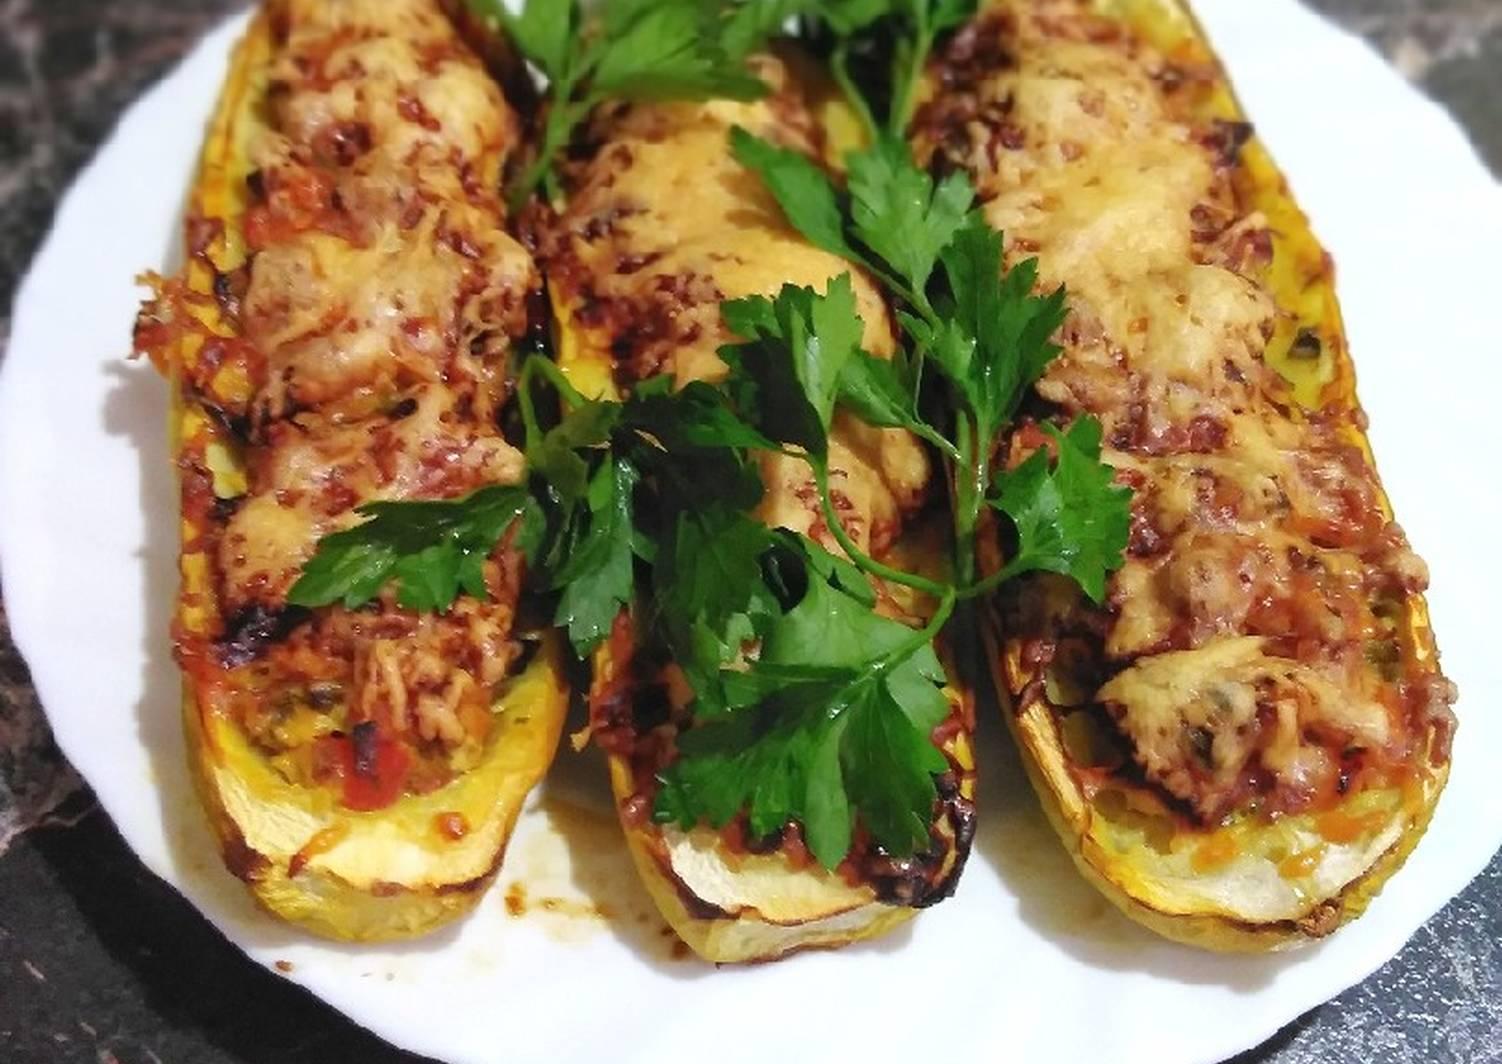 Диетические и пп блюда из кабачков: оладьи, суп, запеканка, кабачковая икра, торт